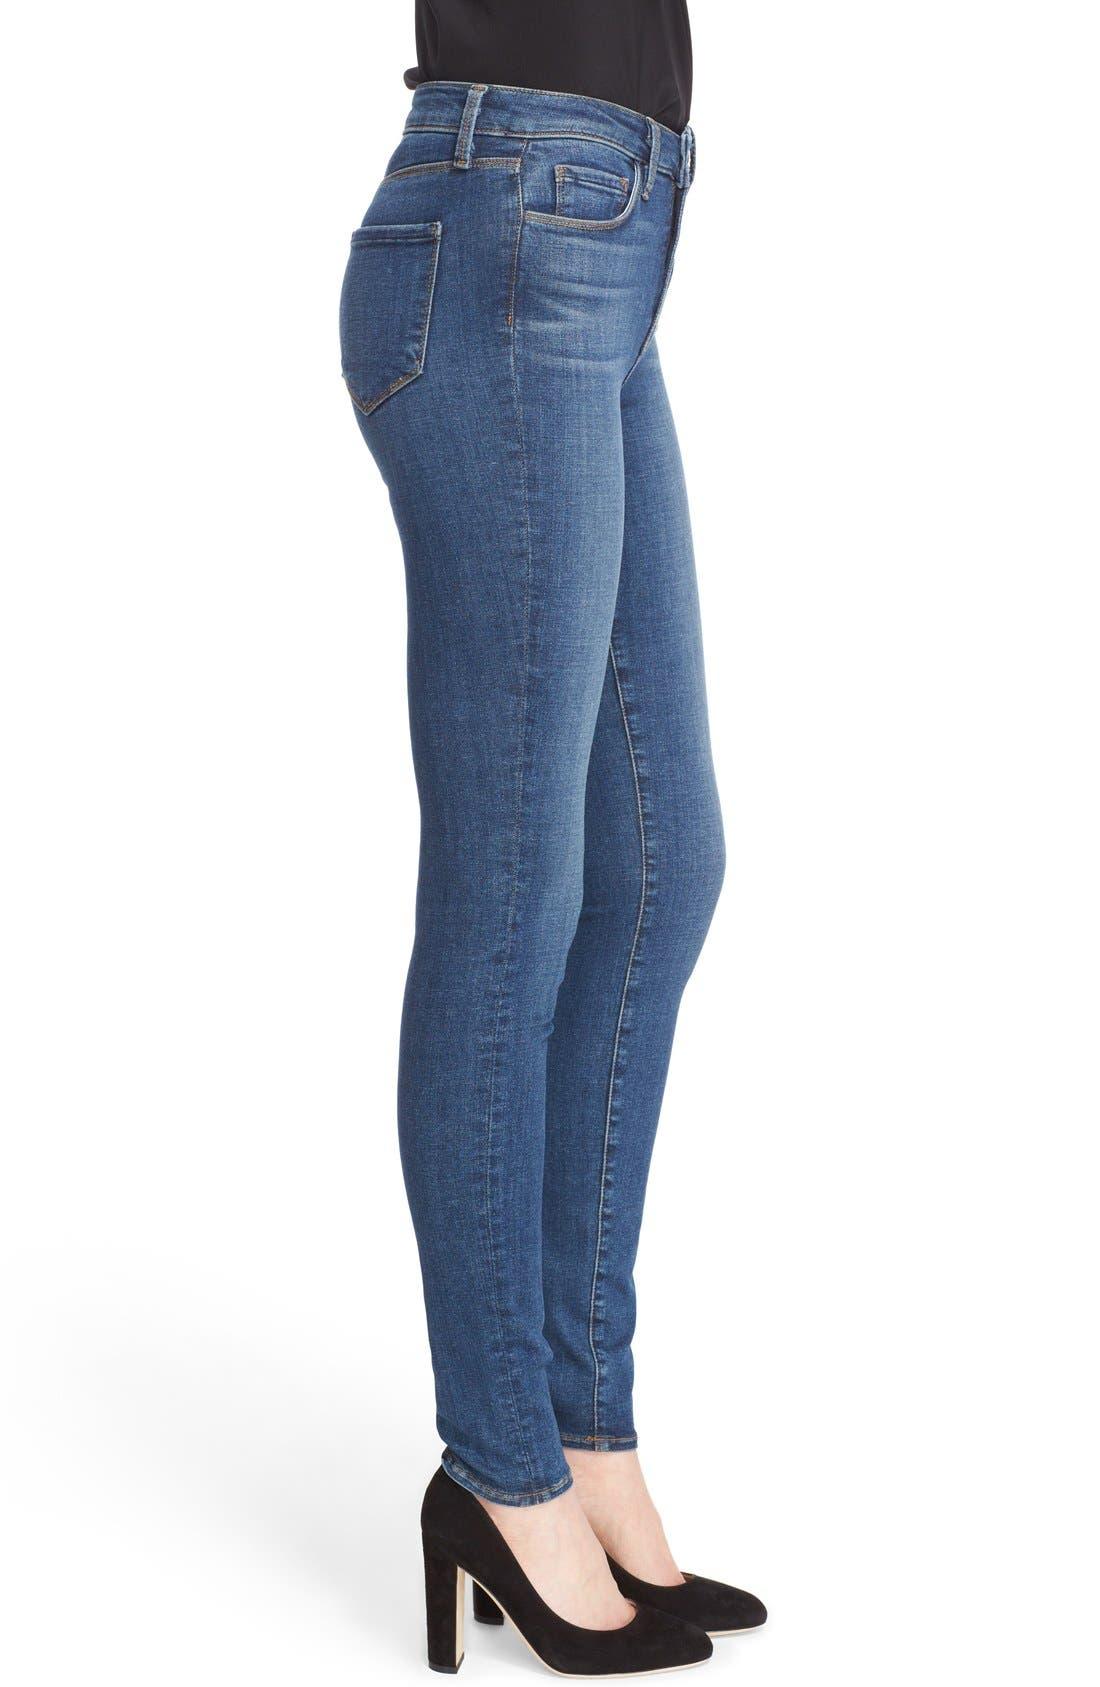 '30' High Rise Skinny Jeans,                             Alternate thumbnail 3, color,                             Dark Vintage